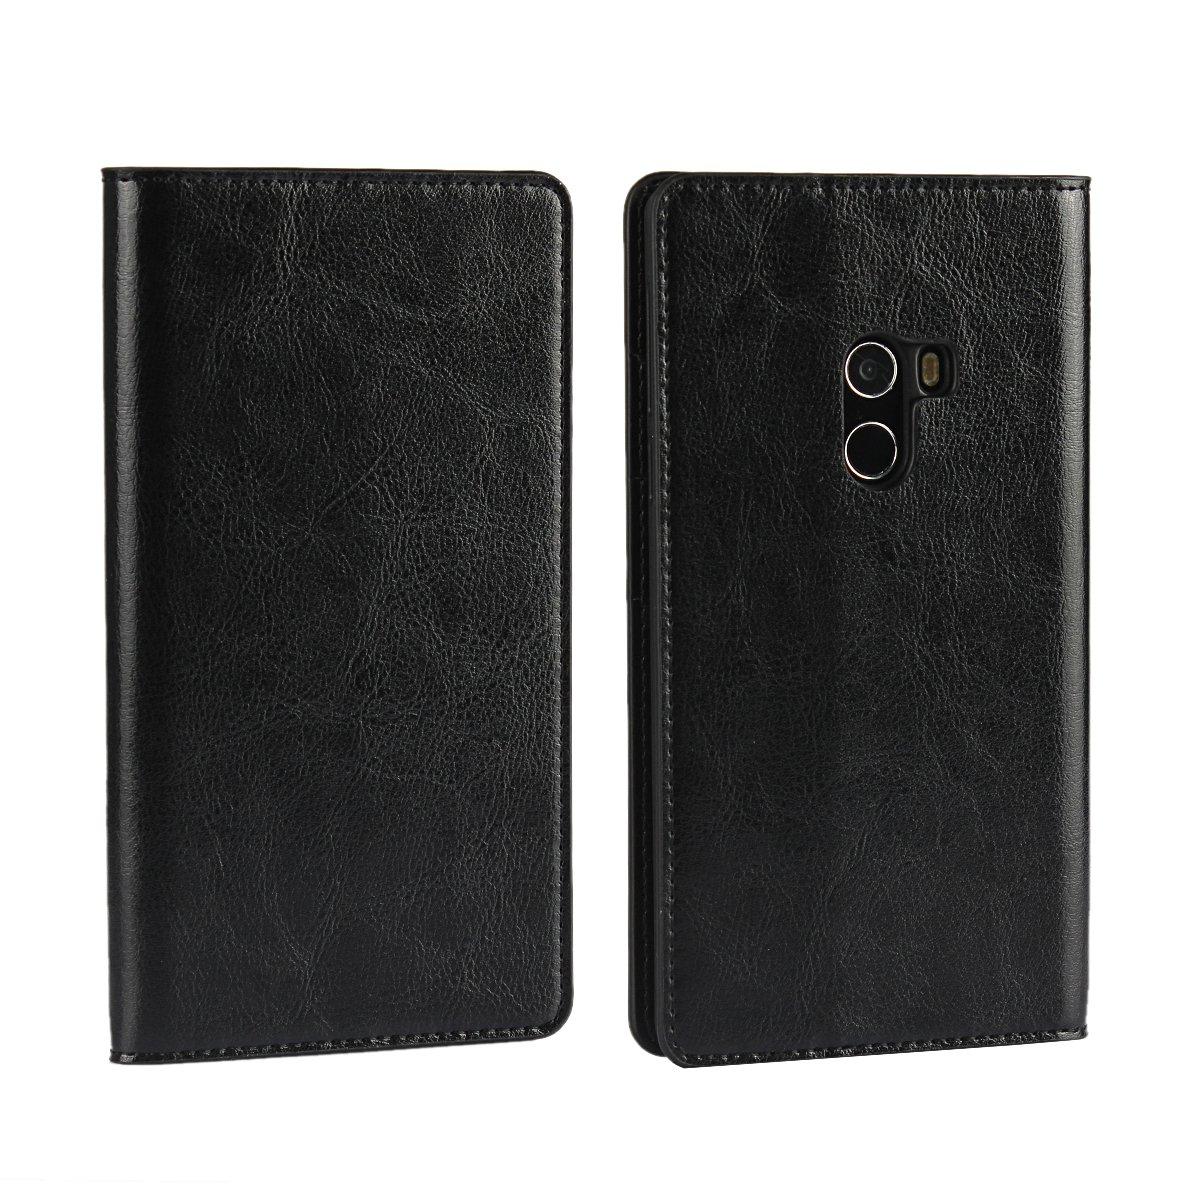 TOTOOSE Xiaomi Mi Mix Wallet Case, Xiaomi Mi Mix Case, Premium Leather Zipper Wallet Multifunctional Boys Removable Card Slot Pocket Pouch Flip Protective Cover for Xiaomi Mi Mix - Black